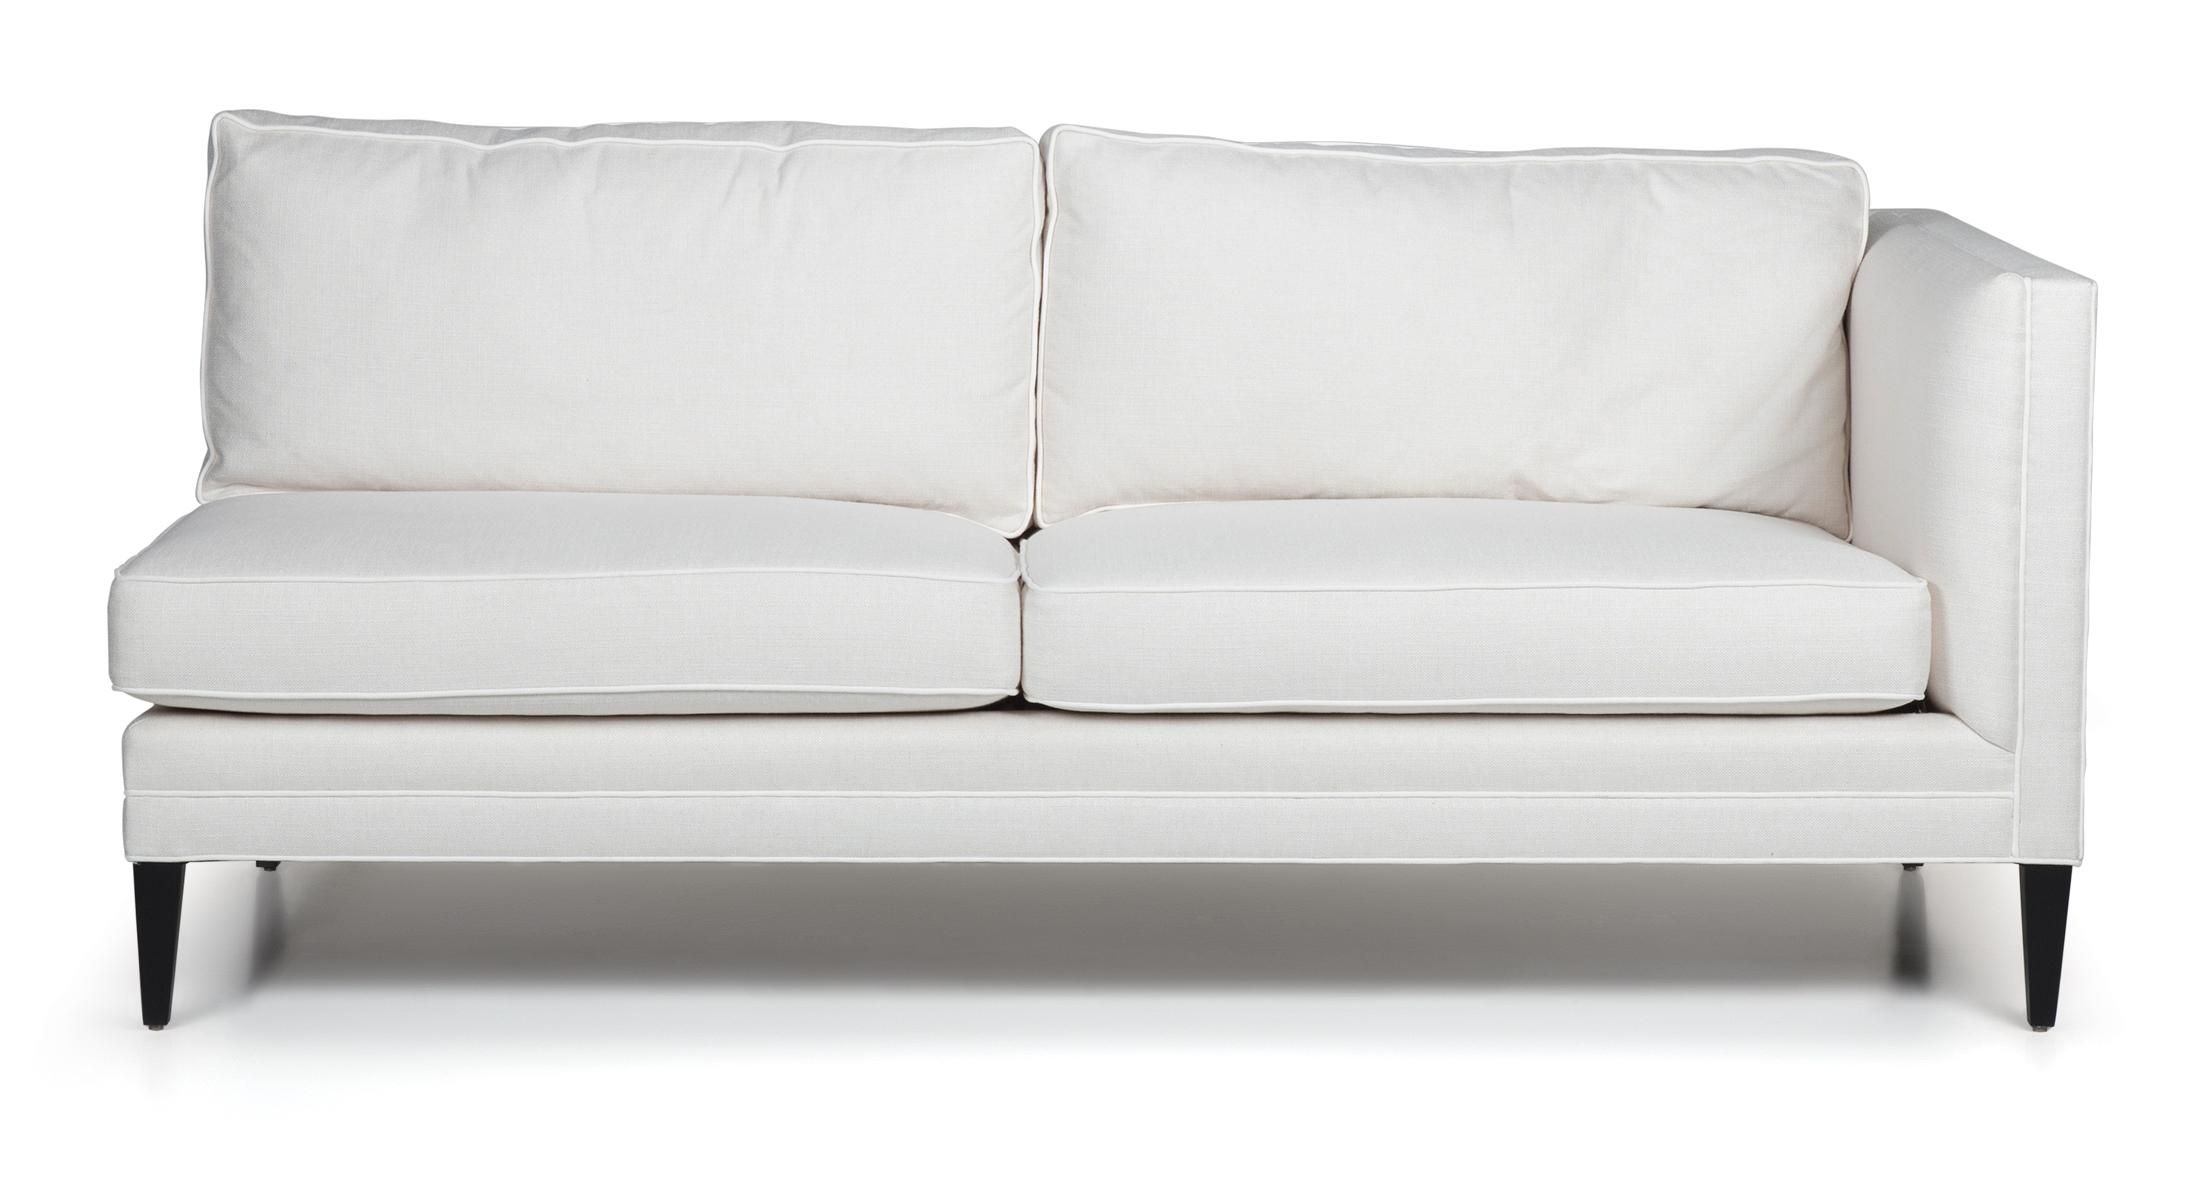 furniture tetrad petite sofas loveseat sofa fabric windermere upholstery